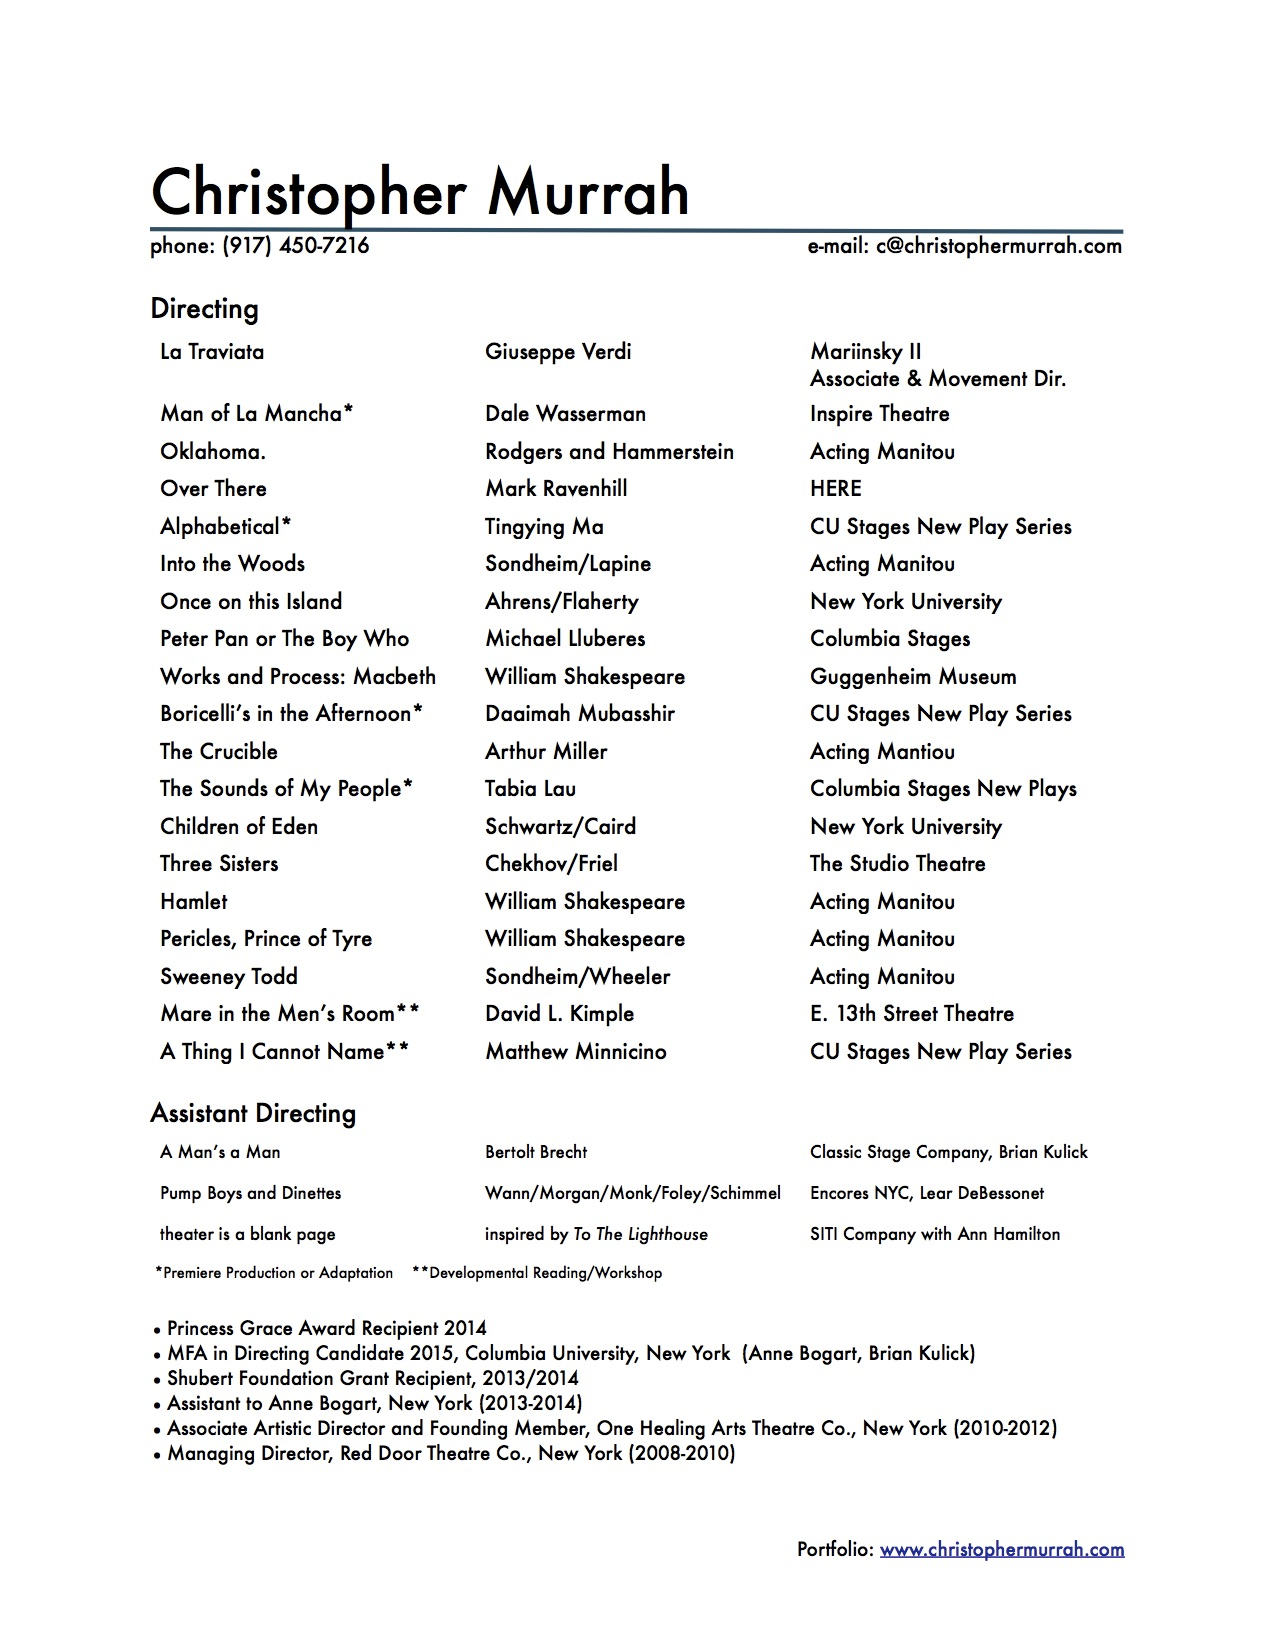 Christopher Murrah Director Resume.jpg